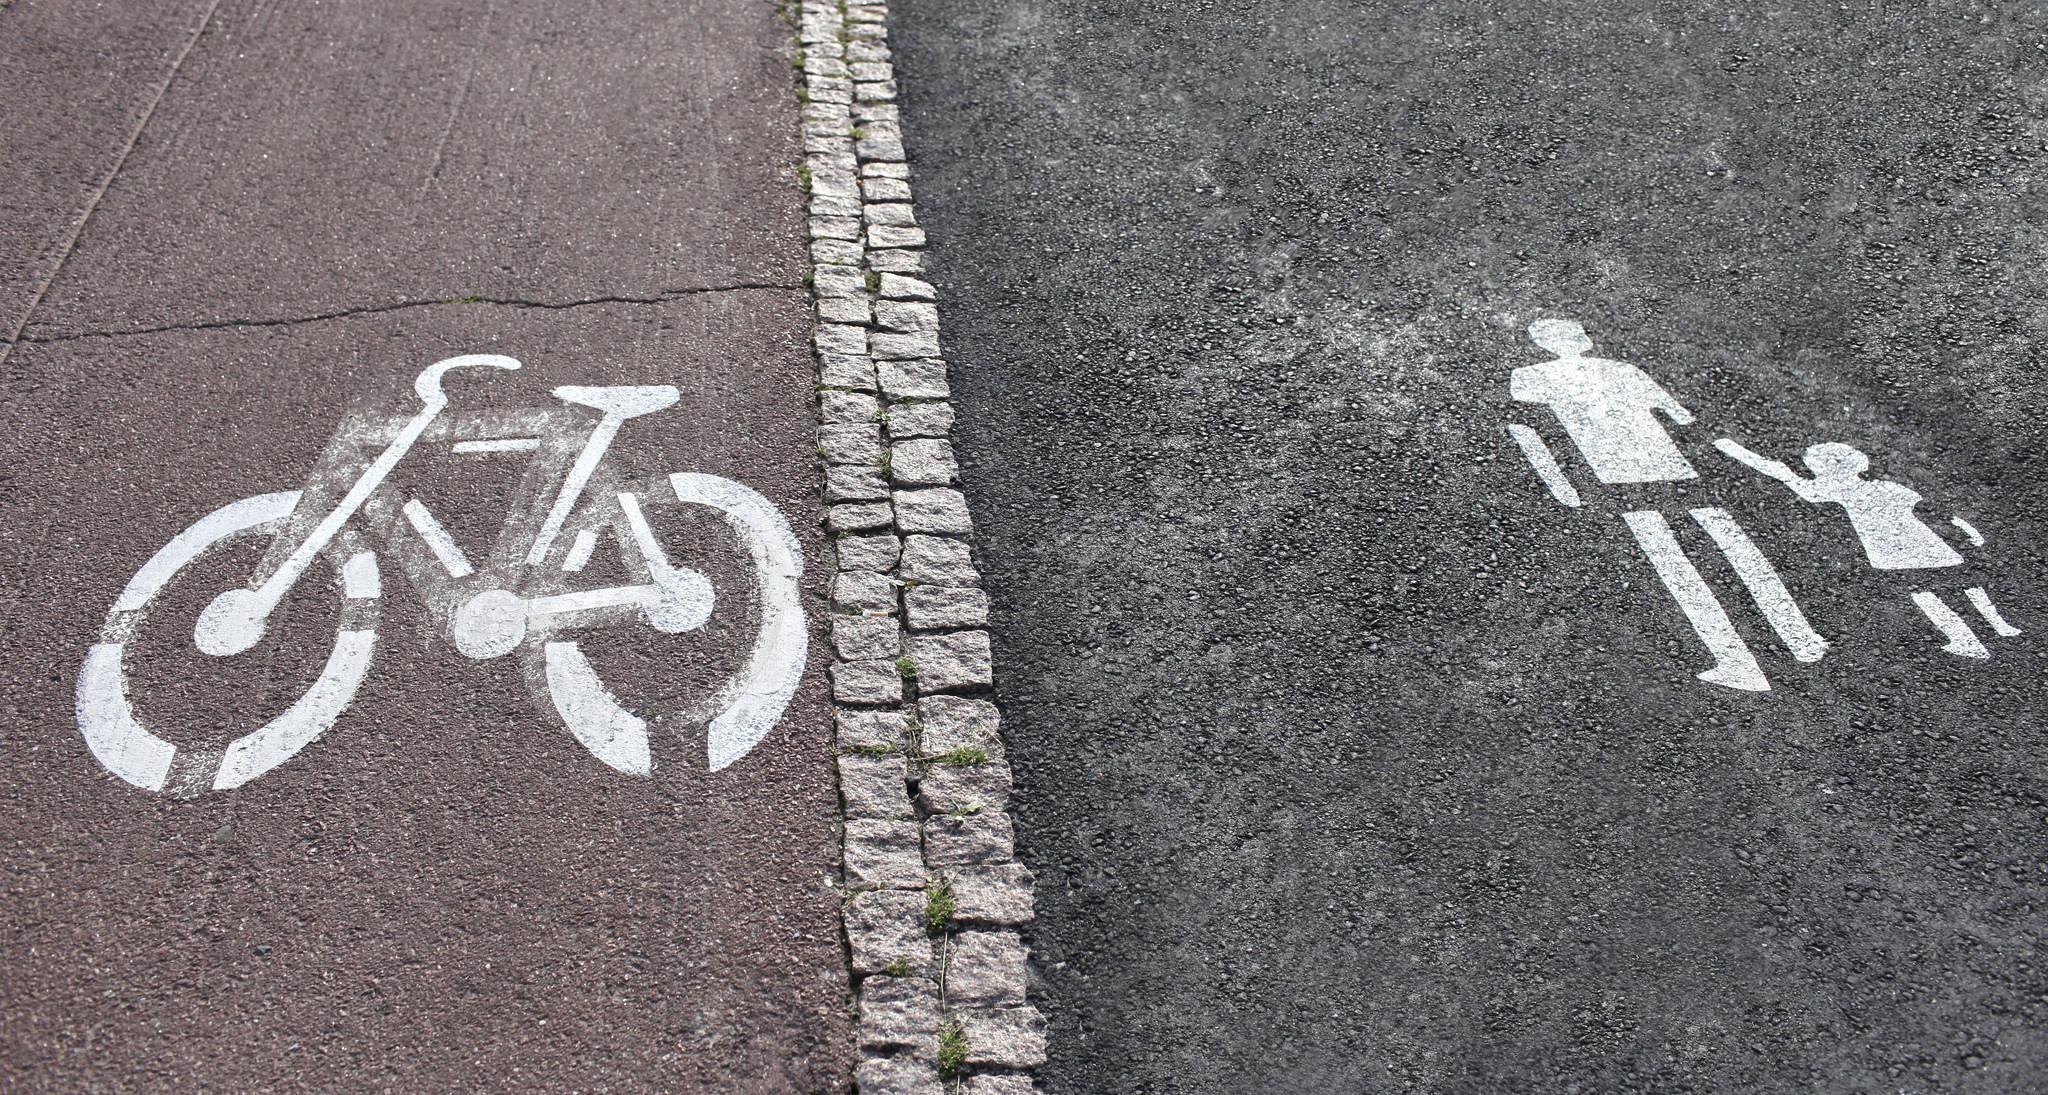 Ciudades caminables carril bici